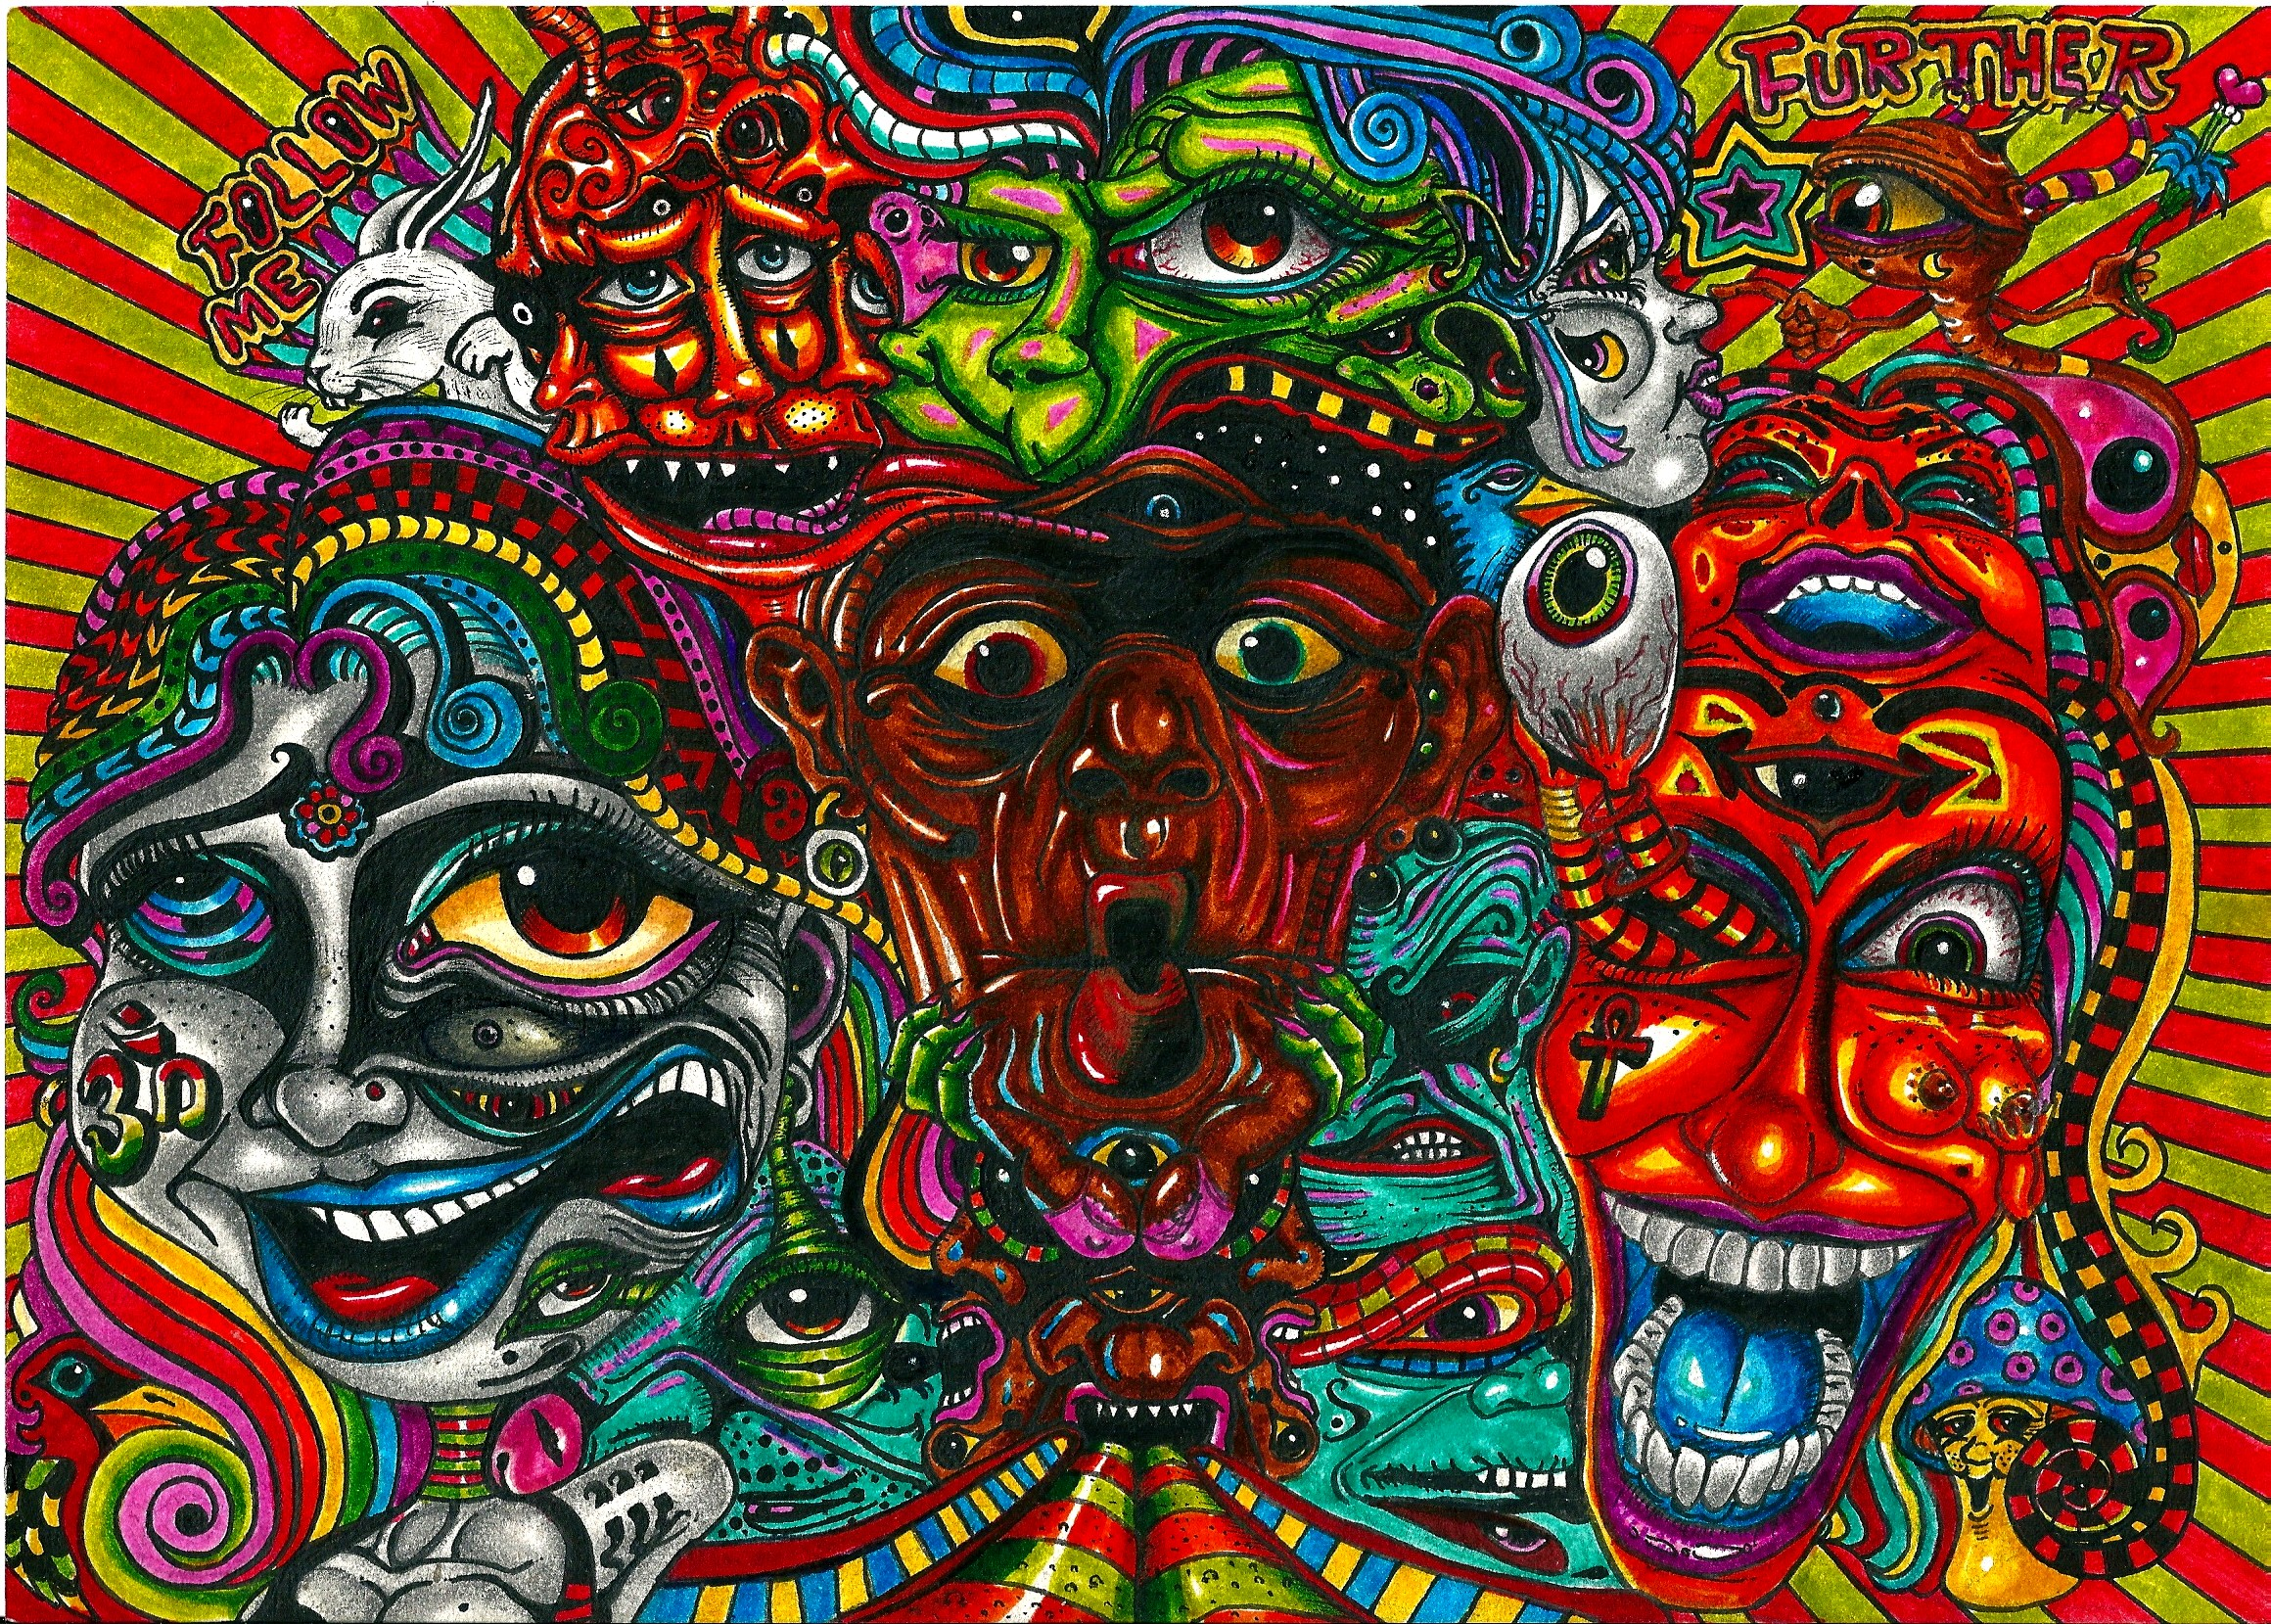 Acid Trip Wallpaper Images Pictures Becuo Lsd Bad Trip 2320x1659 Download Hd Wallpaper Wallpapertip